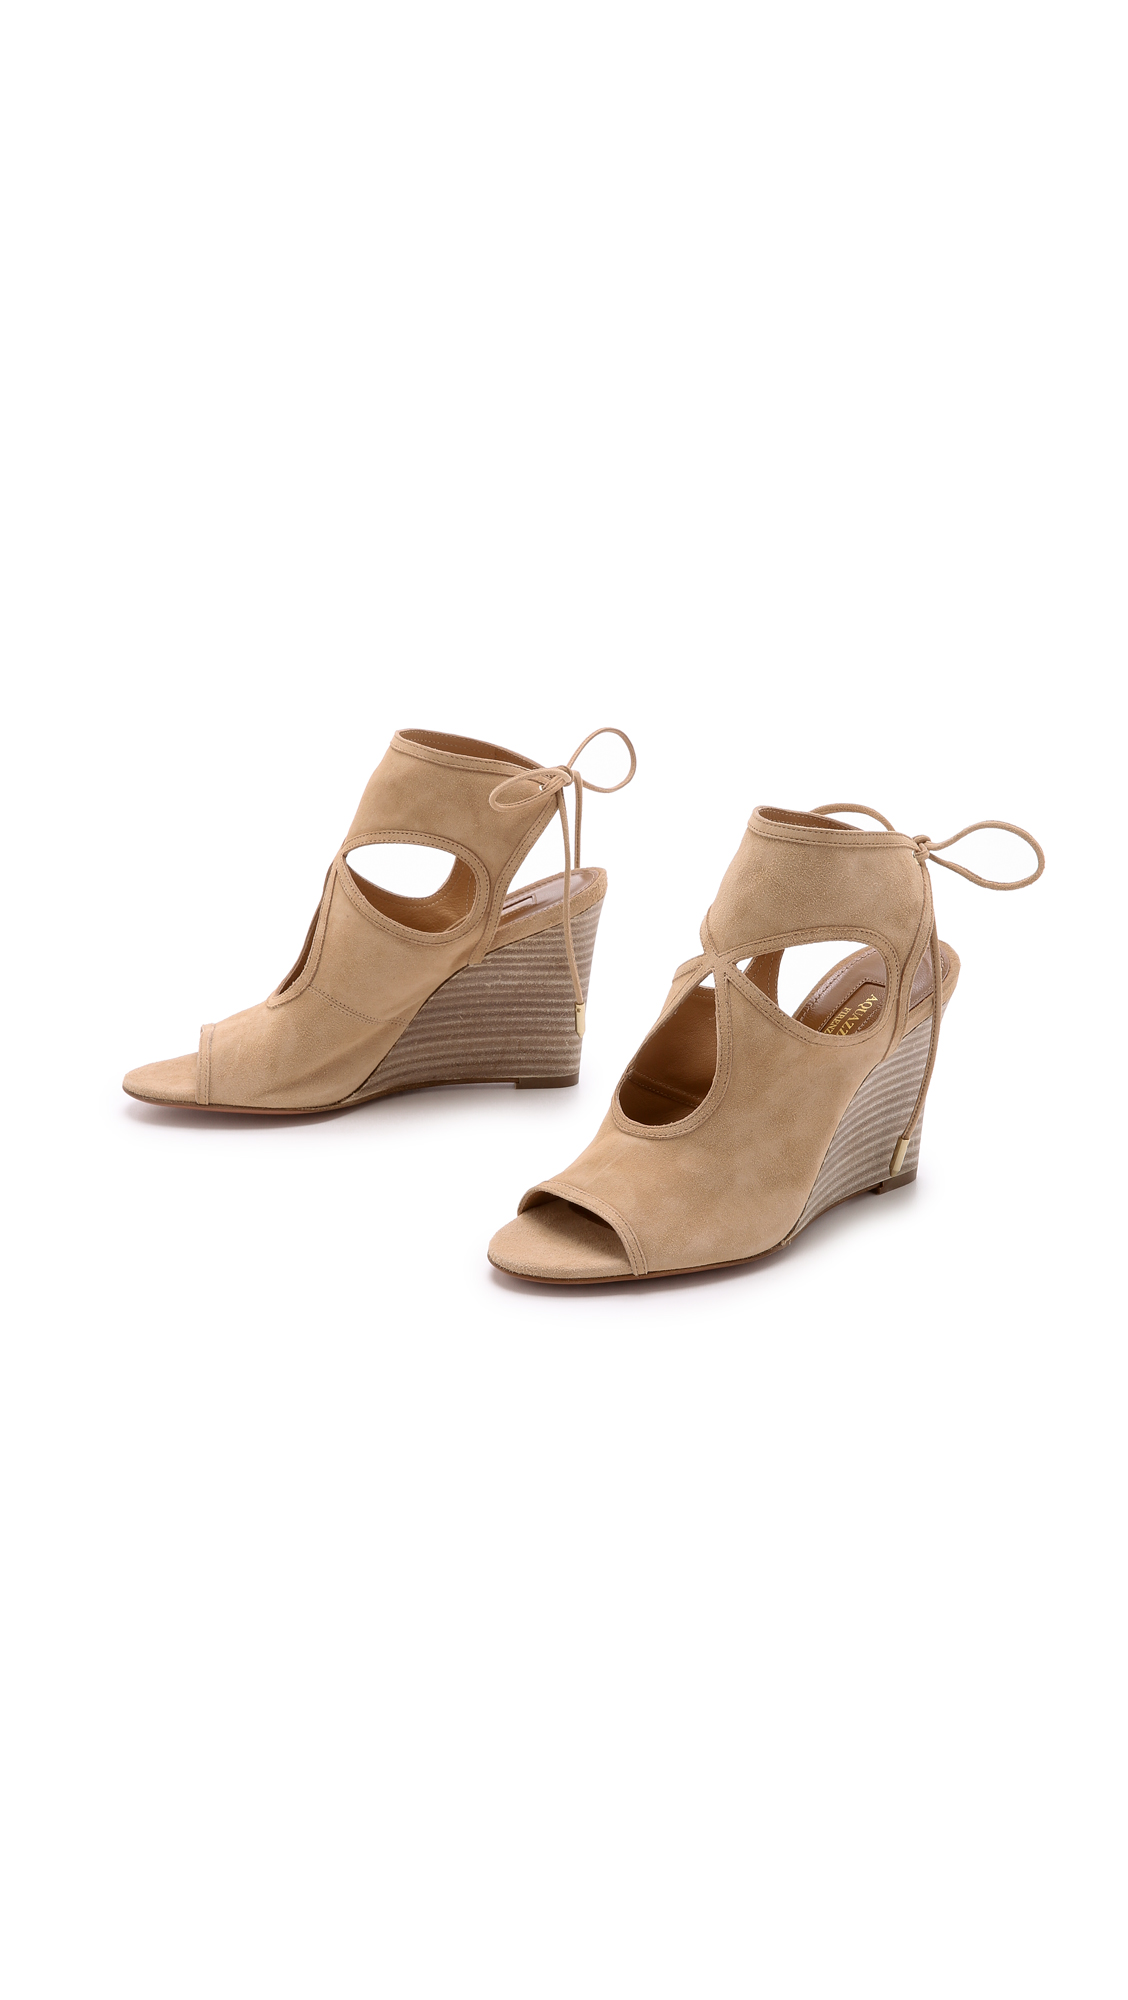 e830f406bac09 Aquazzura Sexy Thing Wedge Sandals